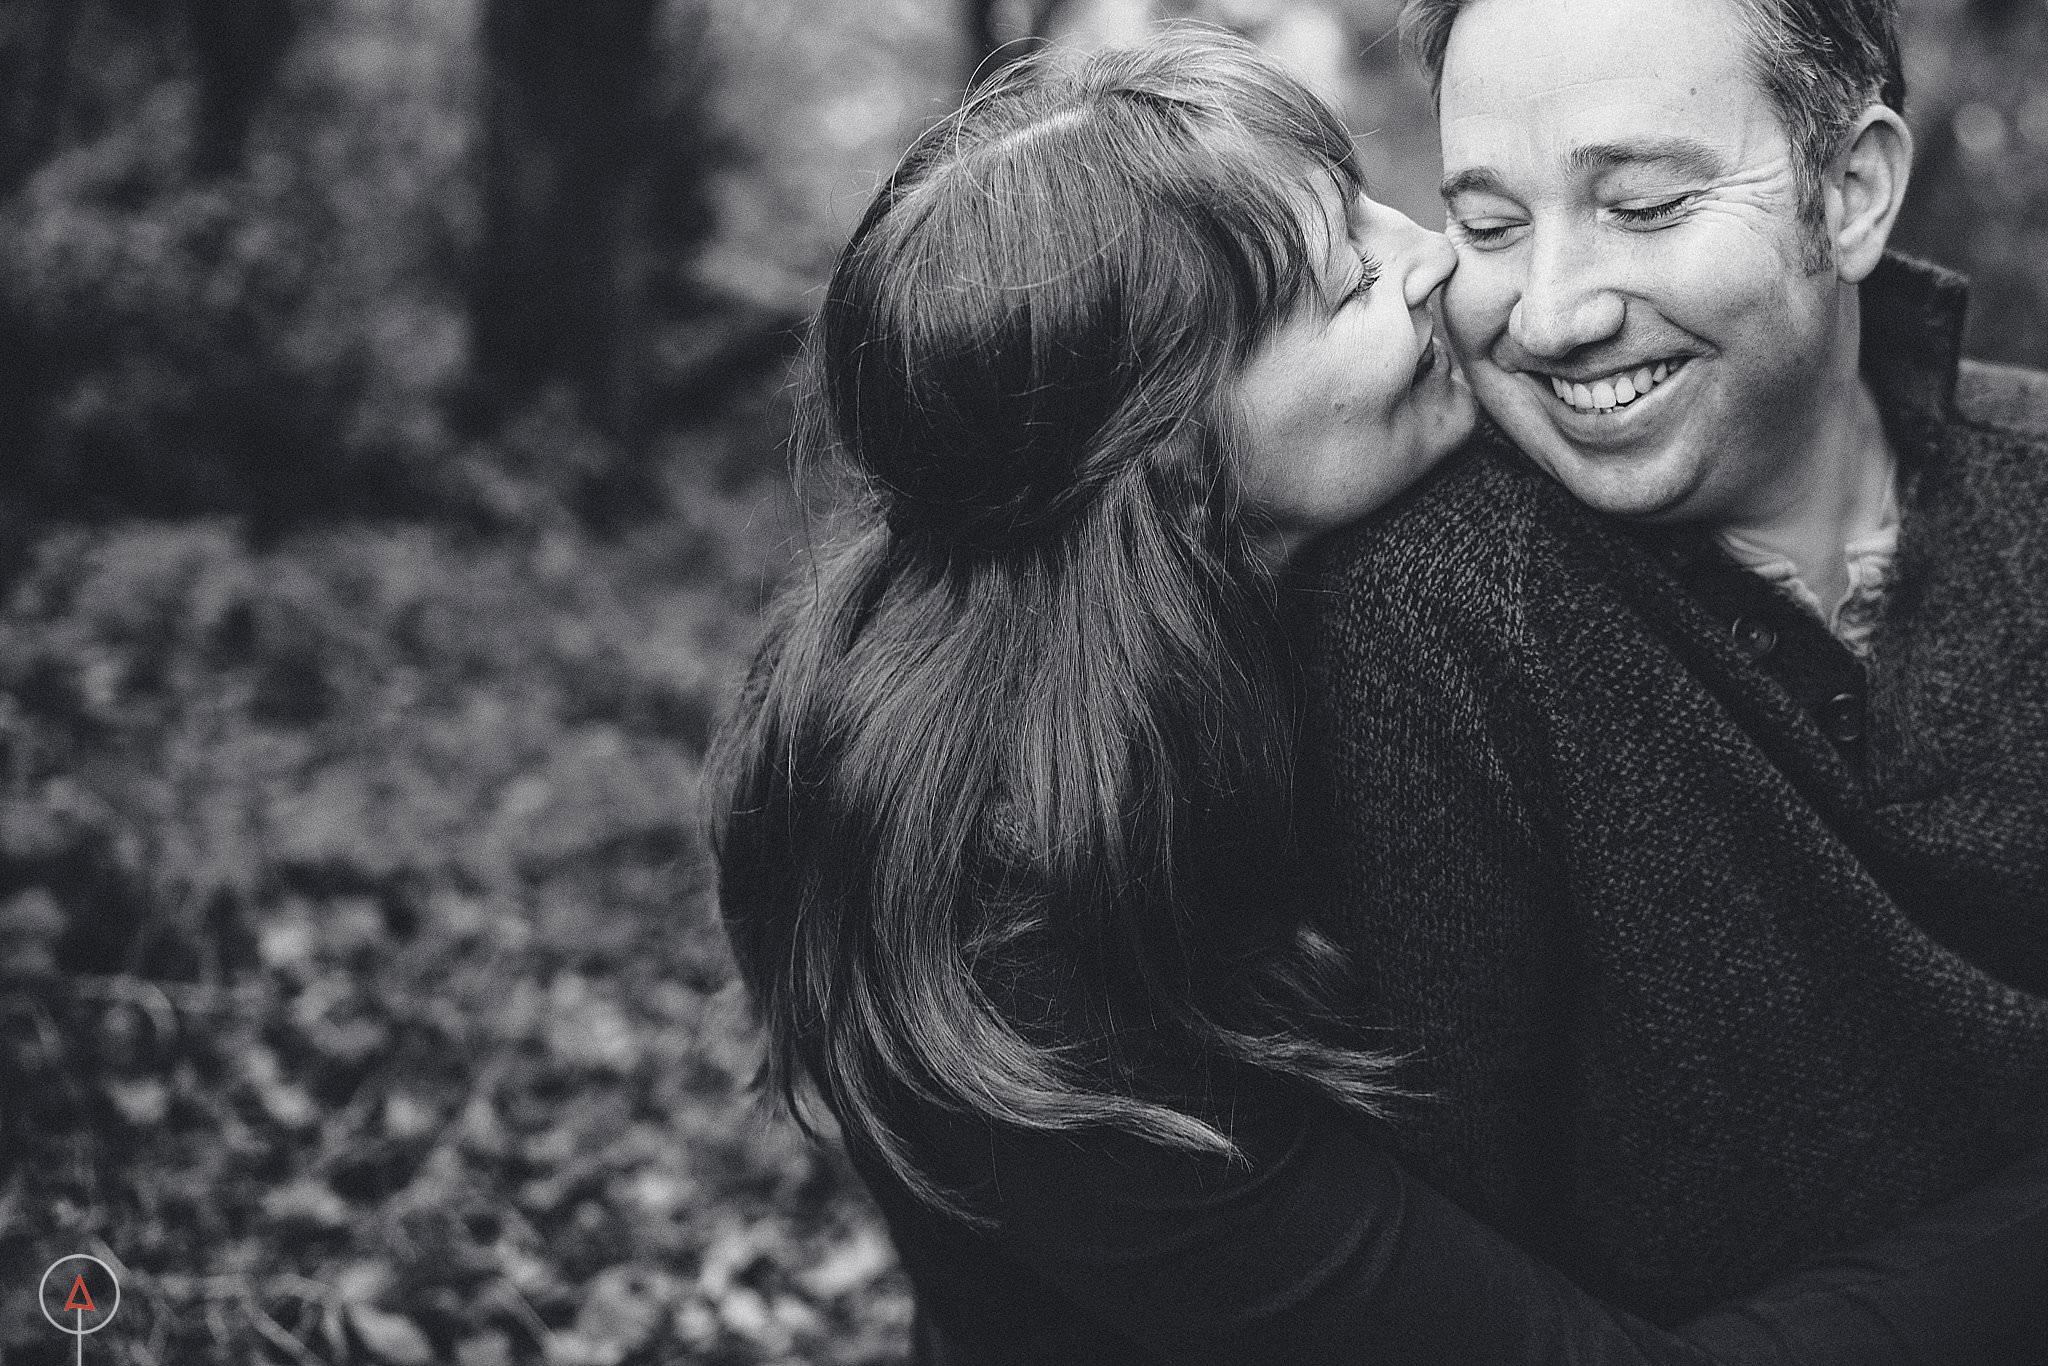 South-Wales-Pre-Wedding-Photography-Aga-Tomaszek-00023